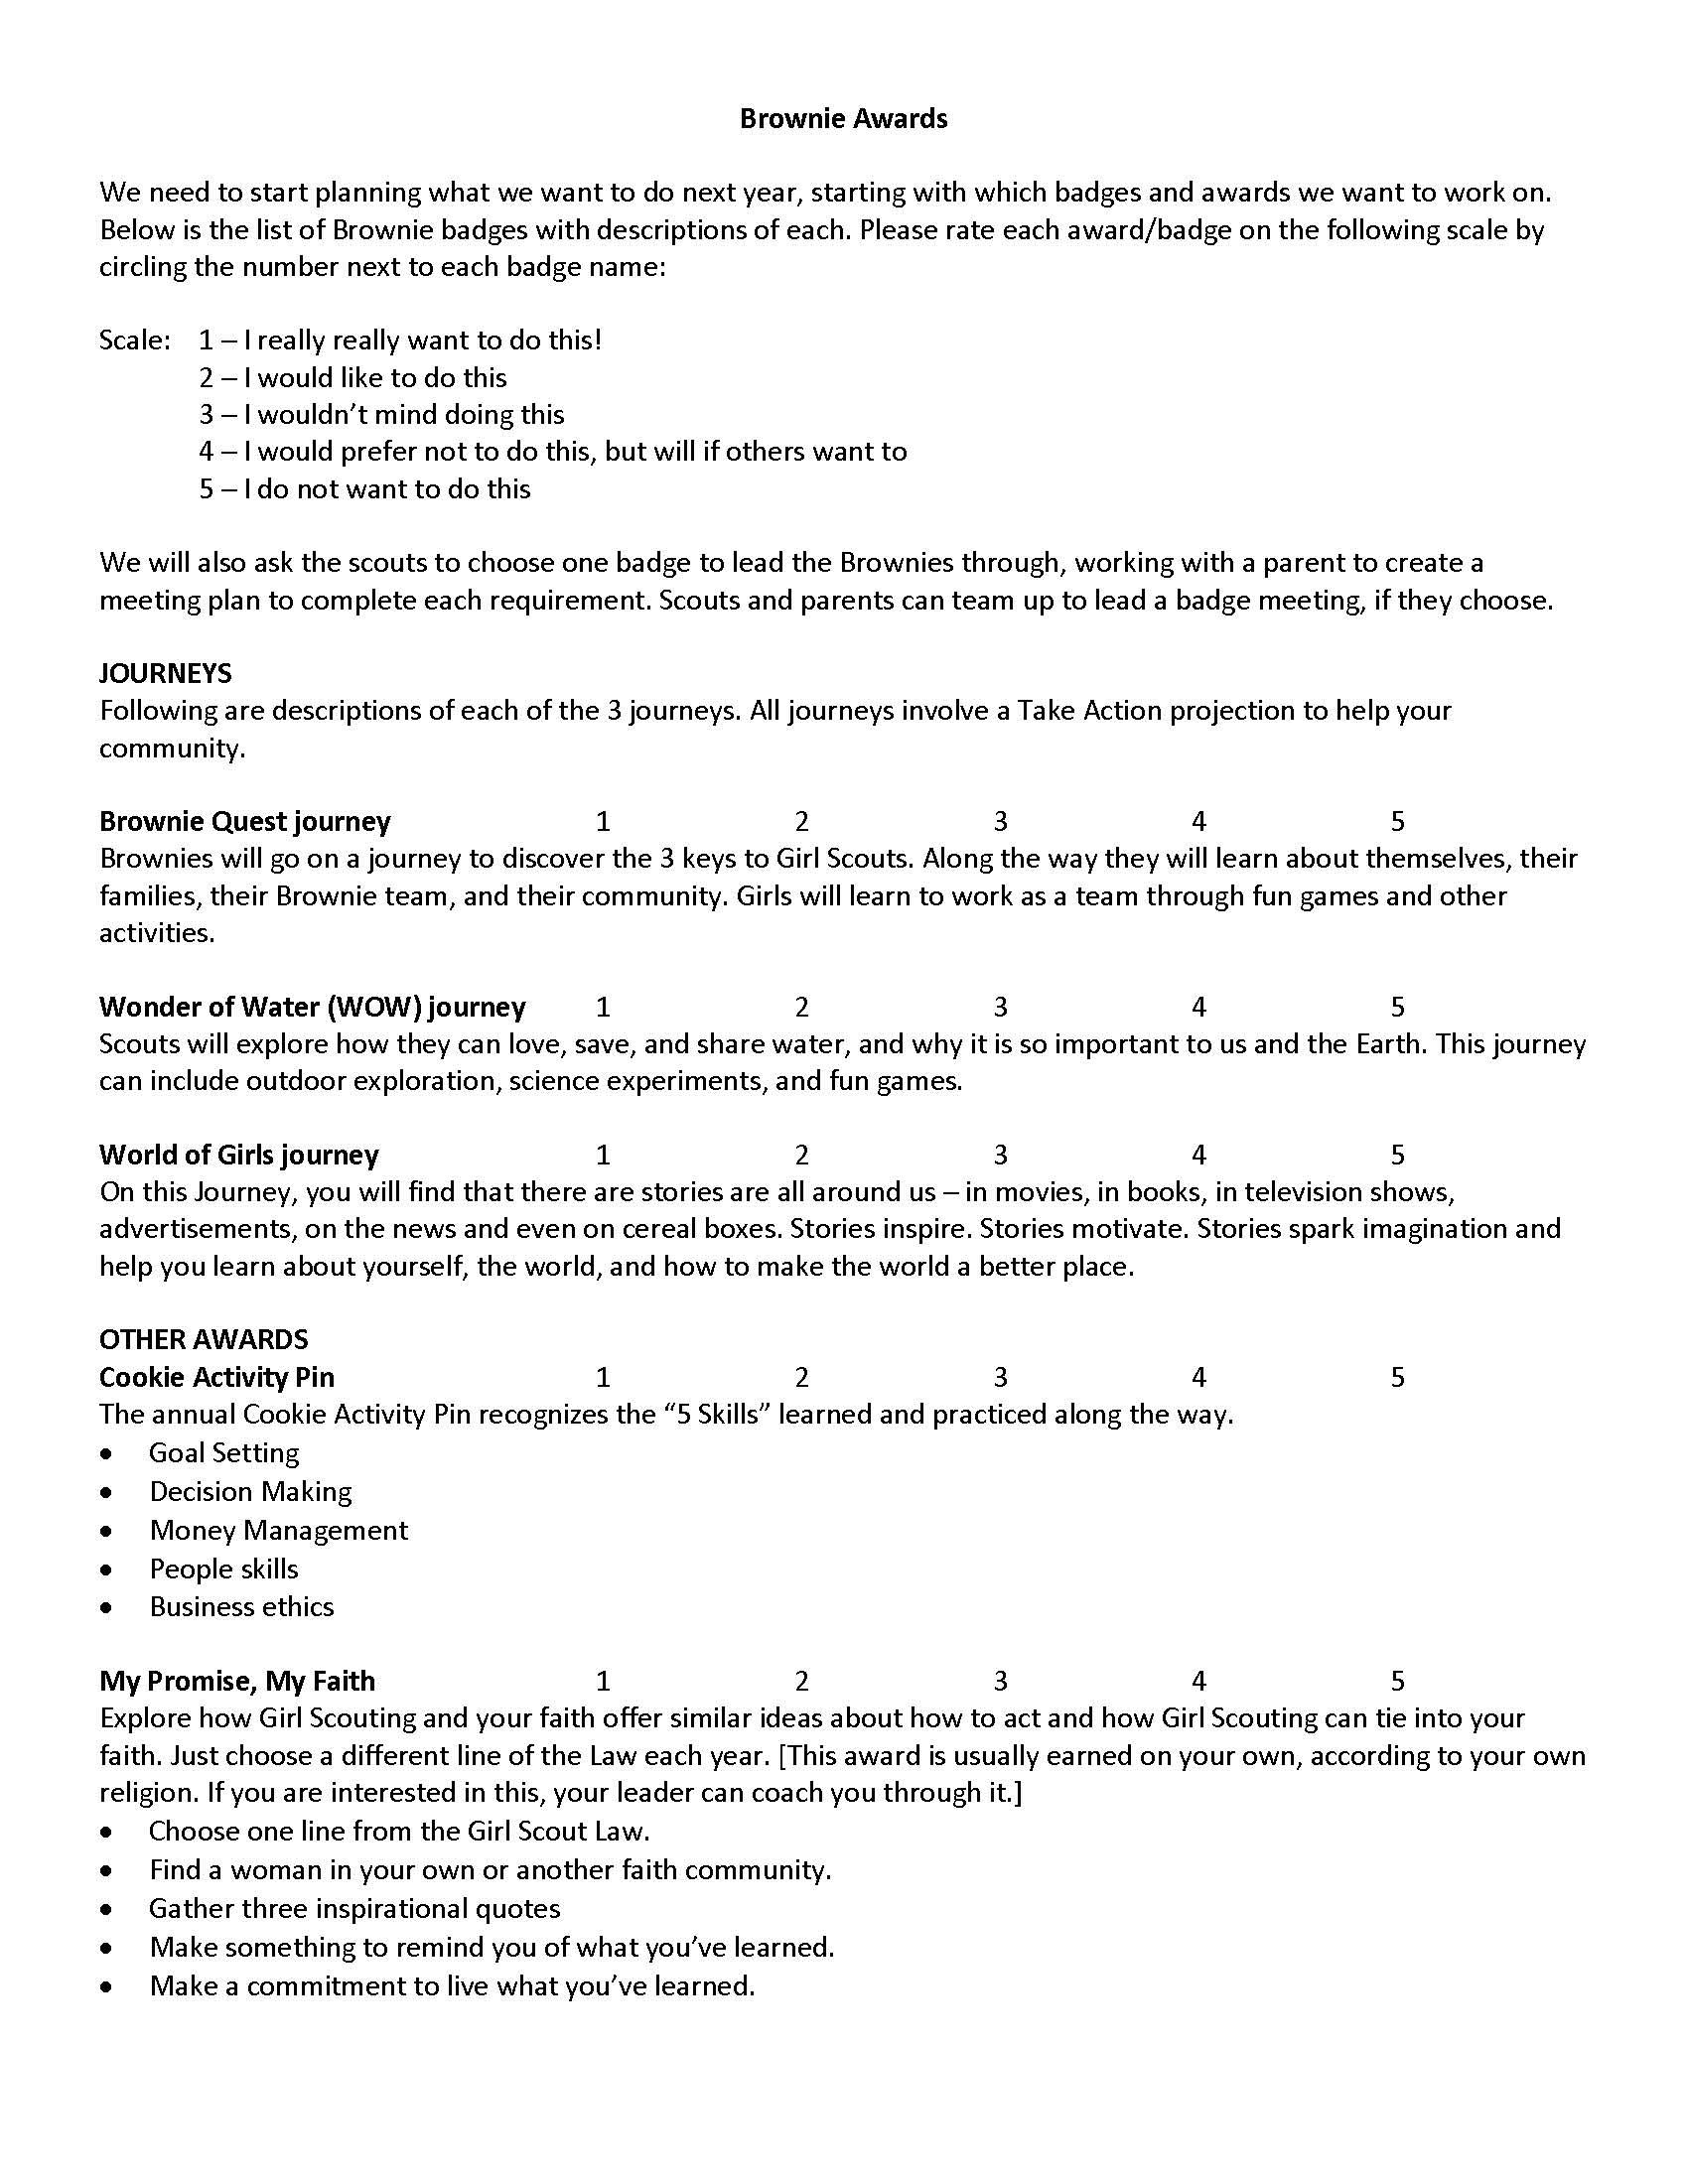 Aviation Merit Badge Worksheet Free Worksheets Library – Aviation Merit Badge Worksheet